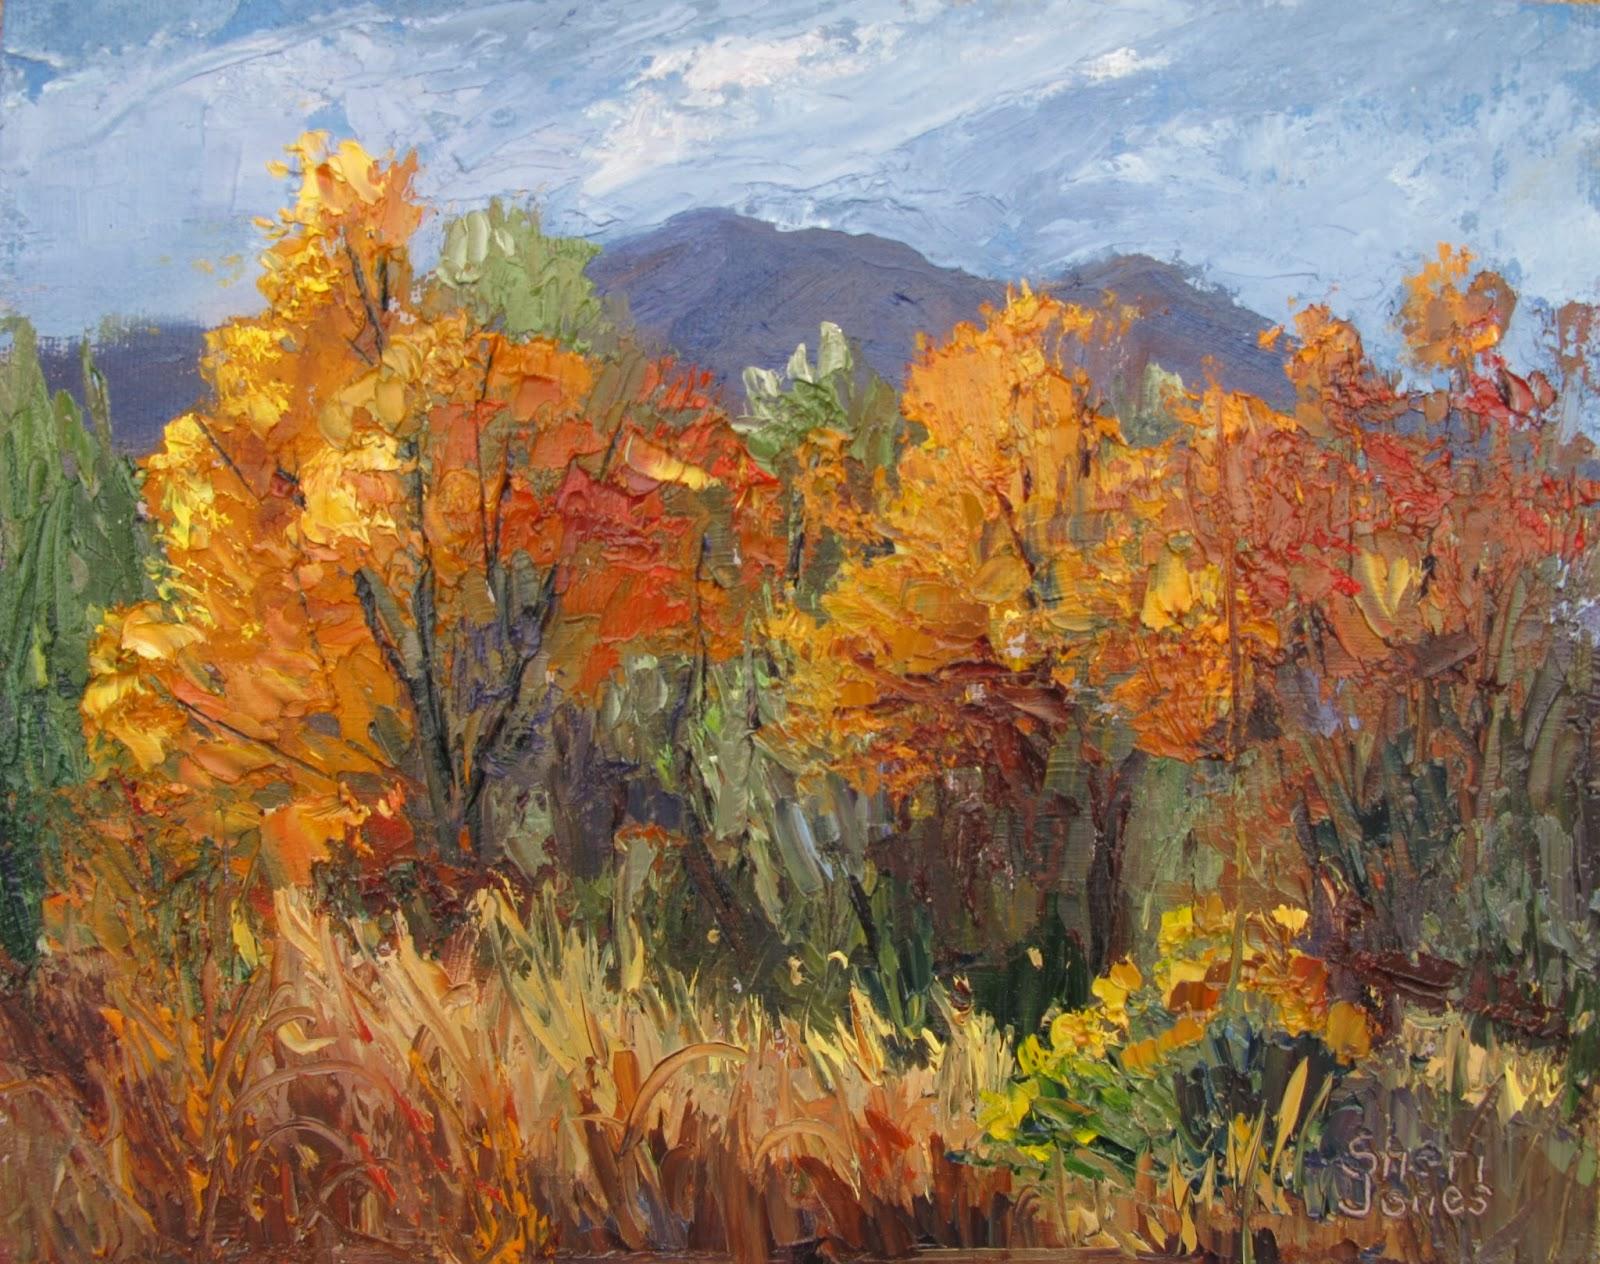 Autumn Landscape Oil Paintings Hot Girls Wallpaper